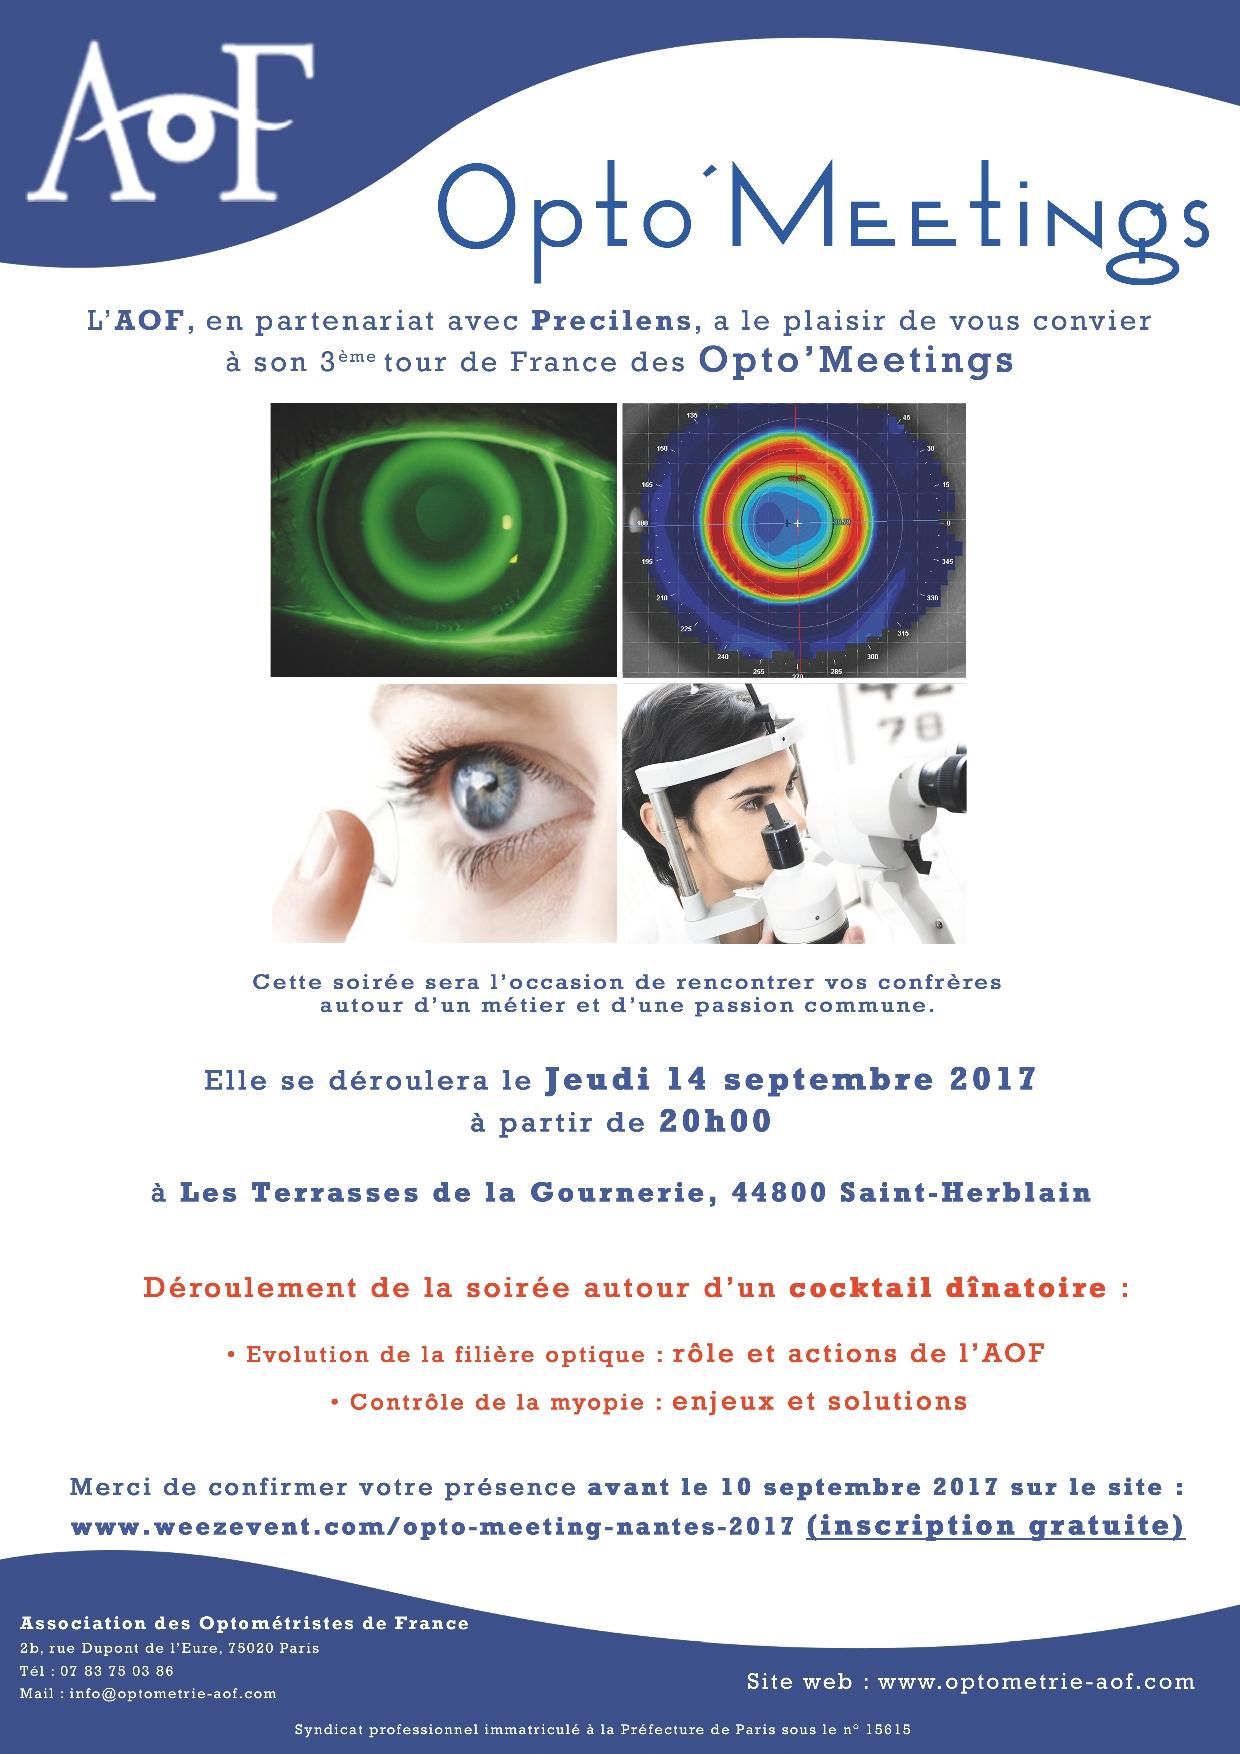 Opto'Meetings Nantes, Inscription gratuite.